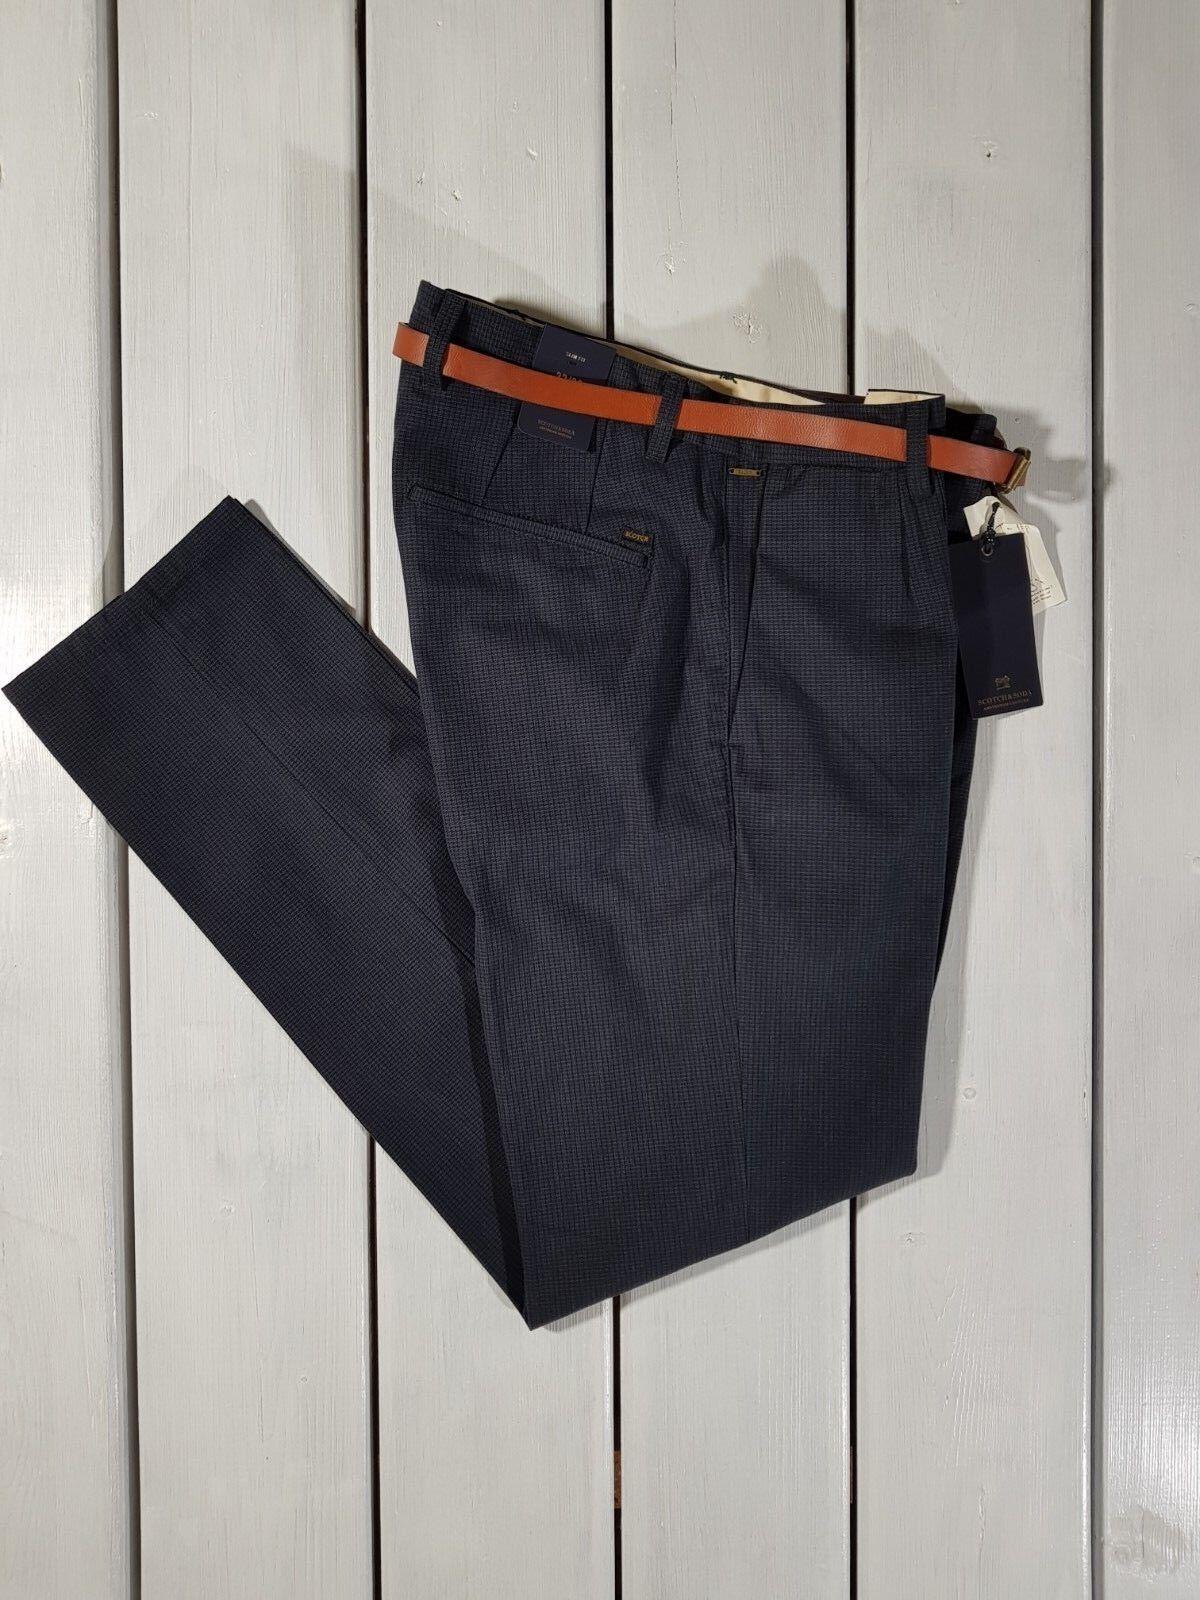 NEW SCOTCH /& SODA MEN/'S TROUSERS STUART SLIM FIT NAVY BLUE PANTS WITH BELT